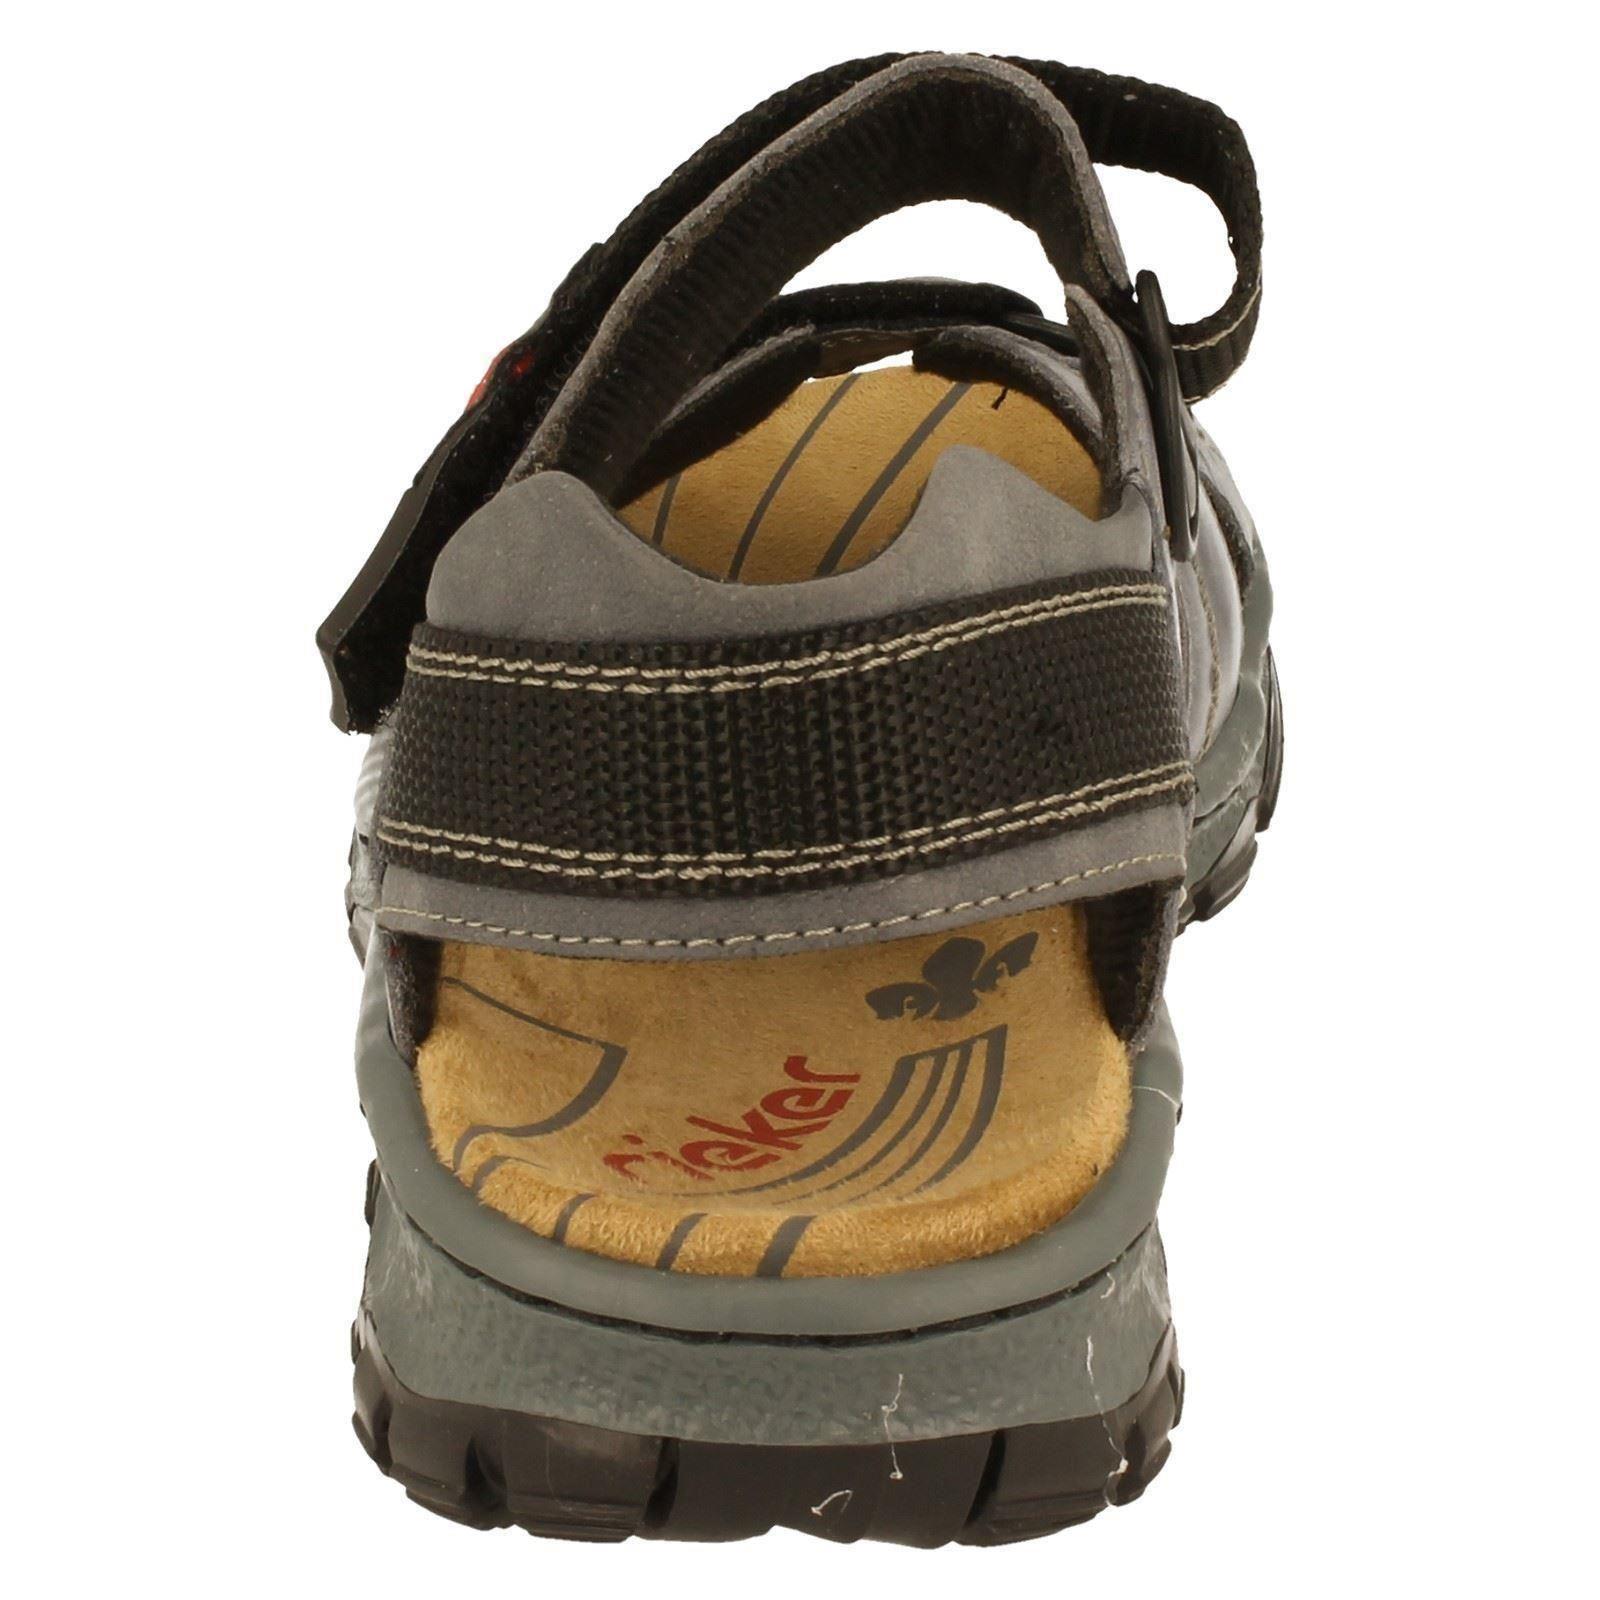 Señoras Rieker Trekking Sandalias 68851-W